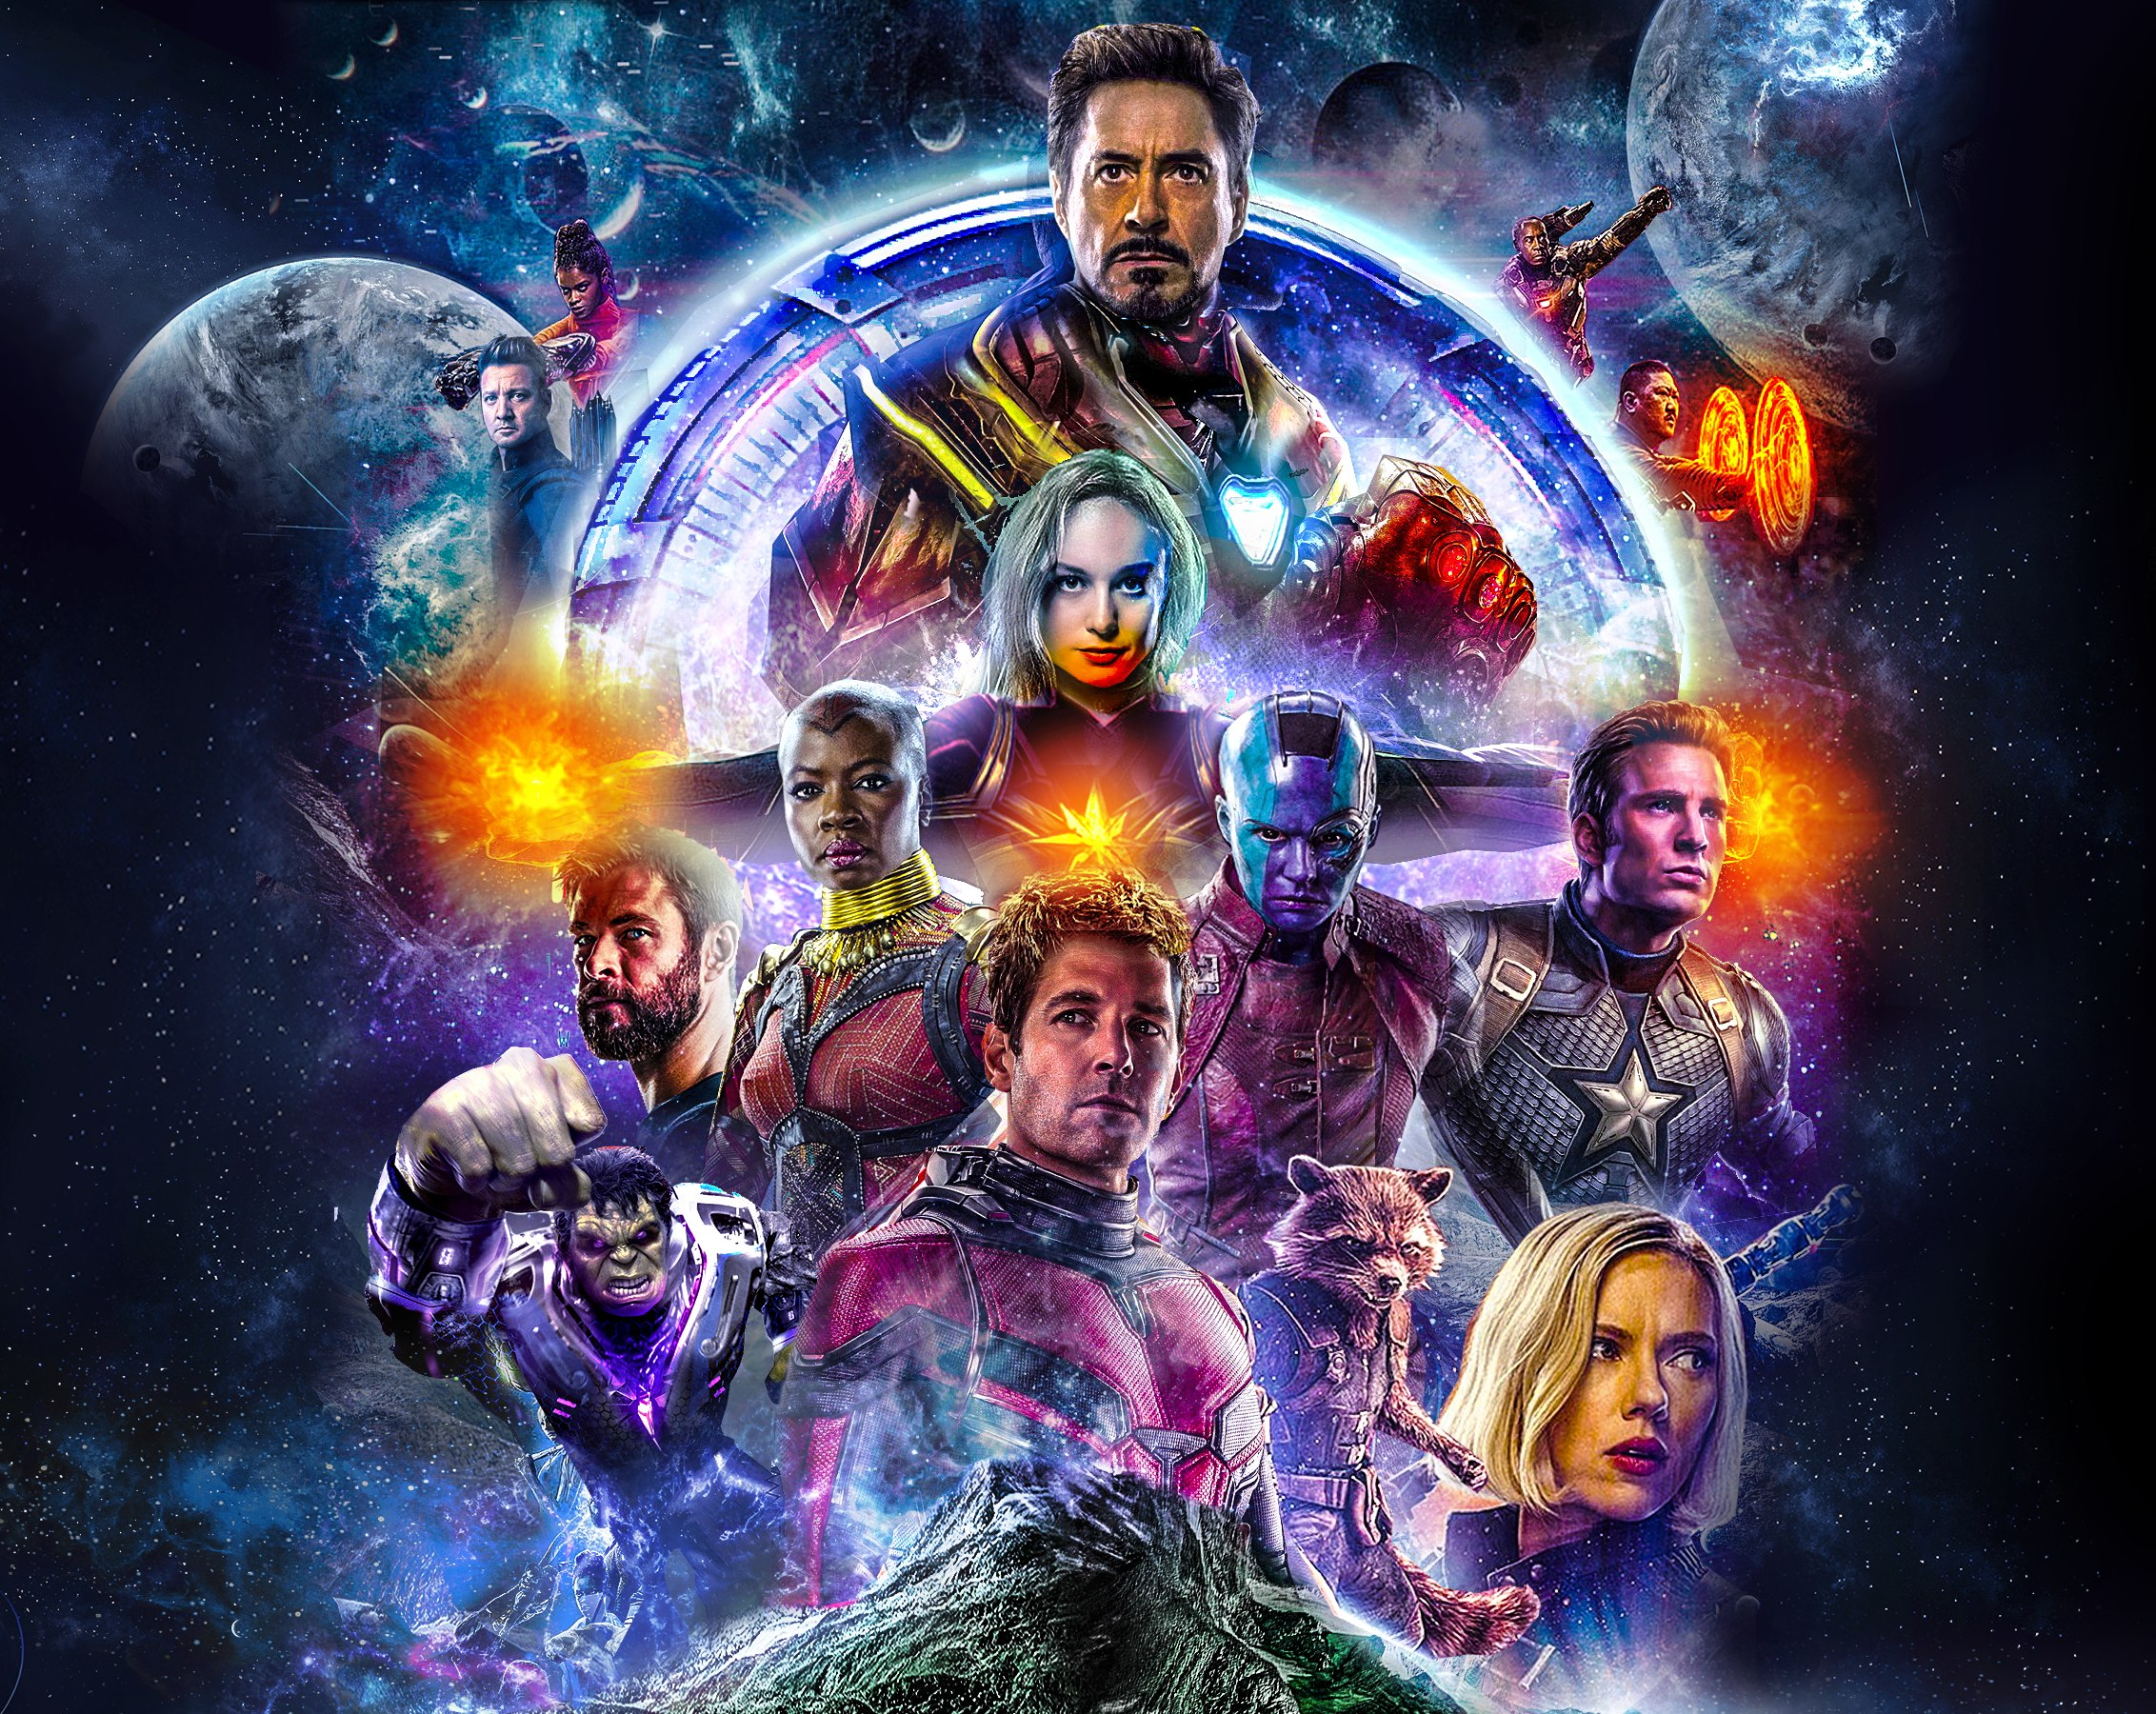 Avengers Endgame Desktop Hd 4k Wallpapers - Wallpaper Cave